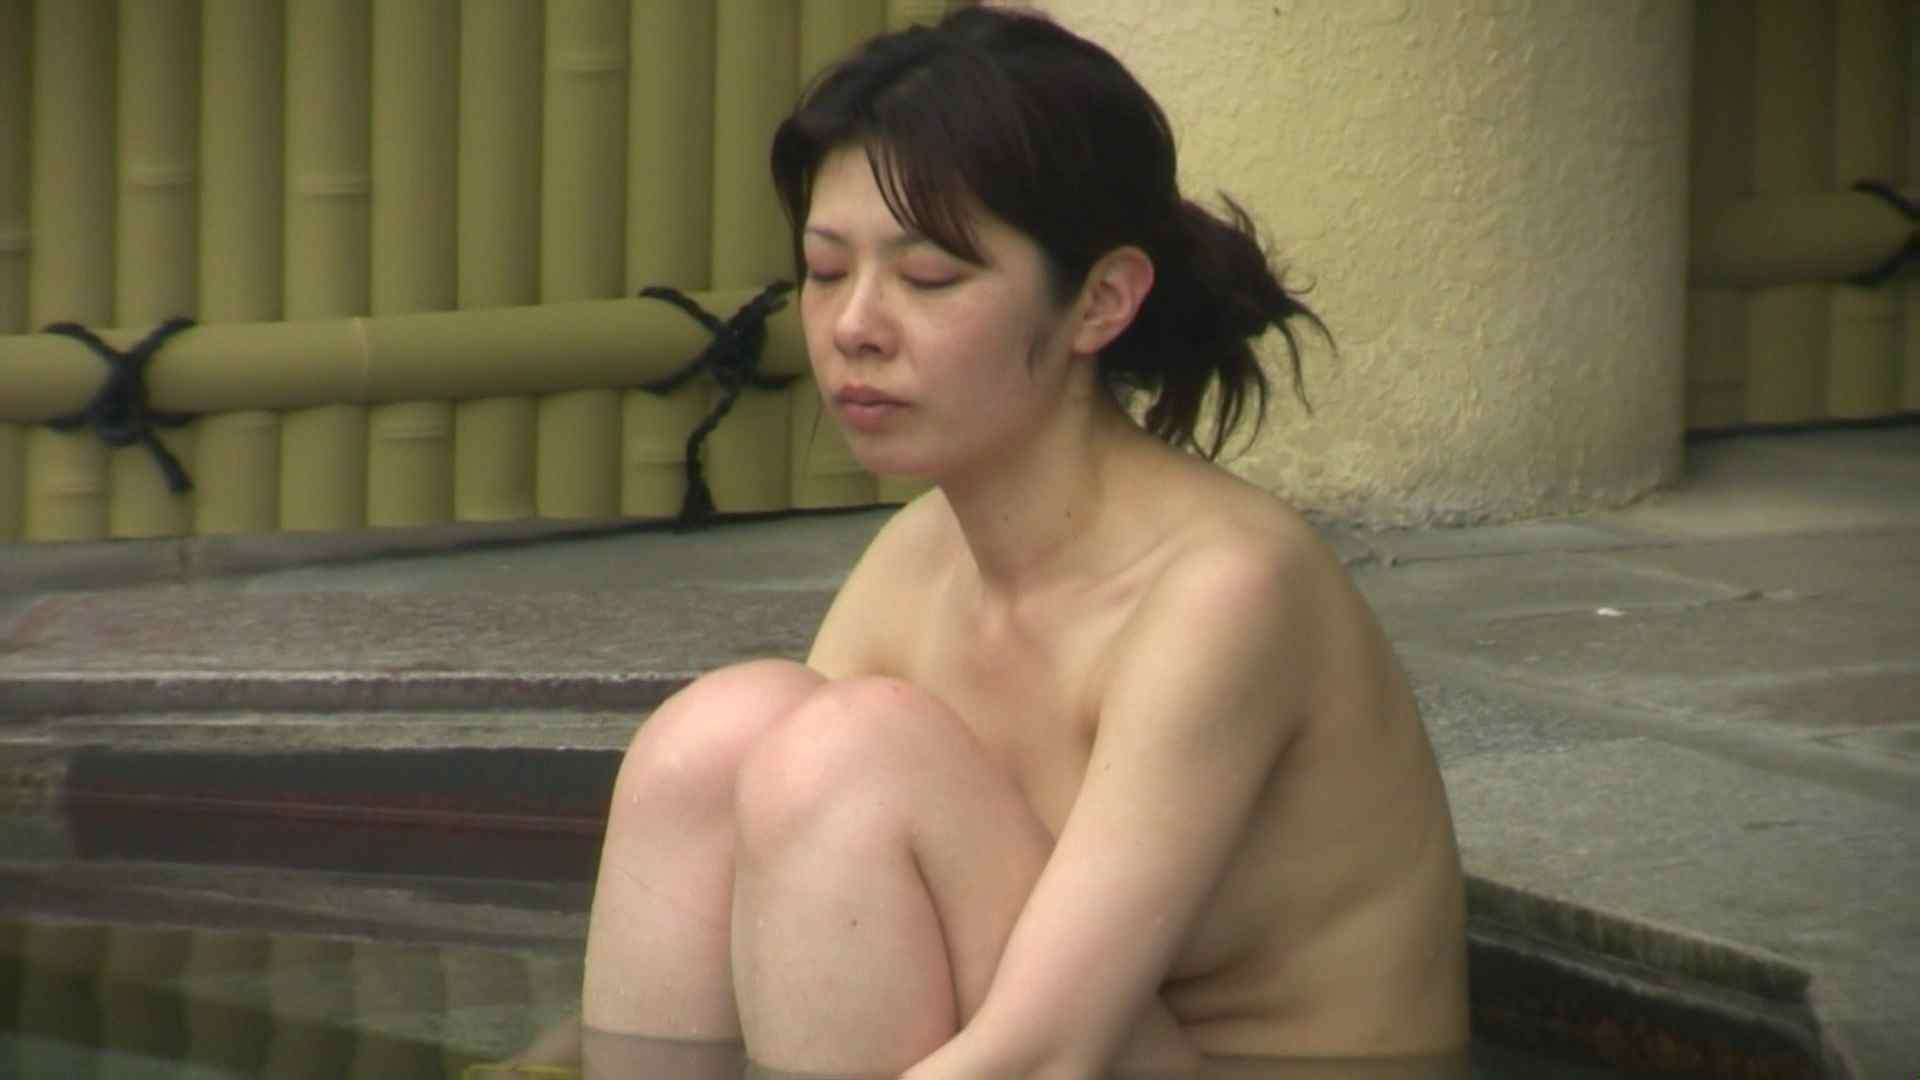 Aquaな露天風呂Vol.676 盗撮シリーズ | 露天風呂編  83PIX 49